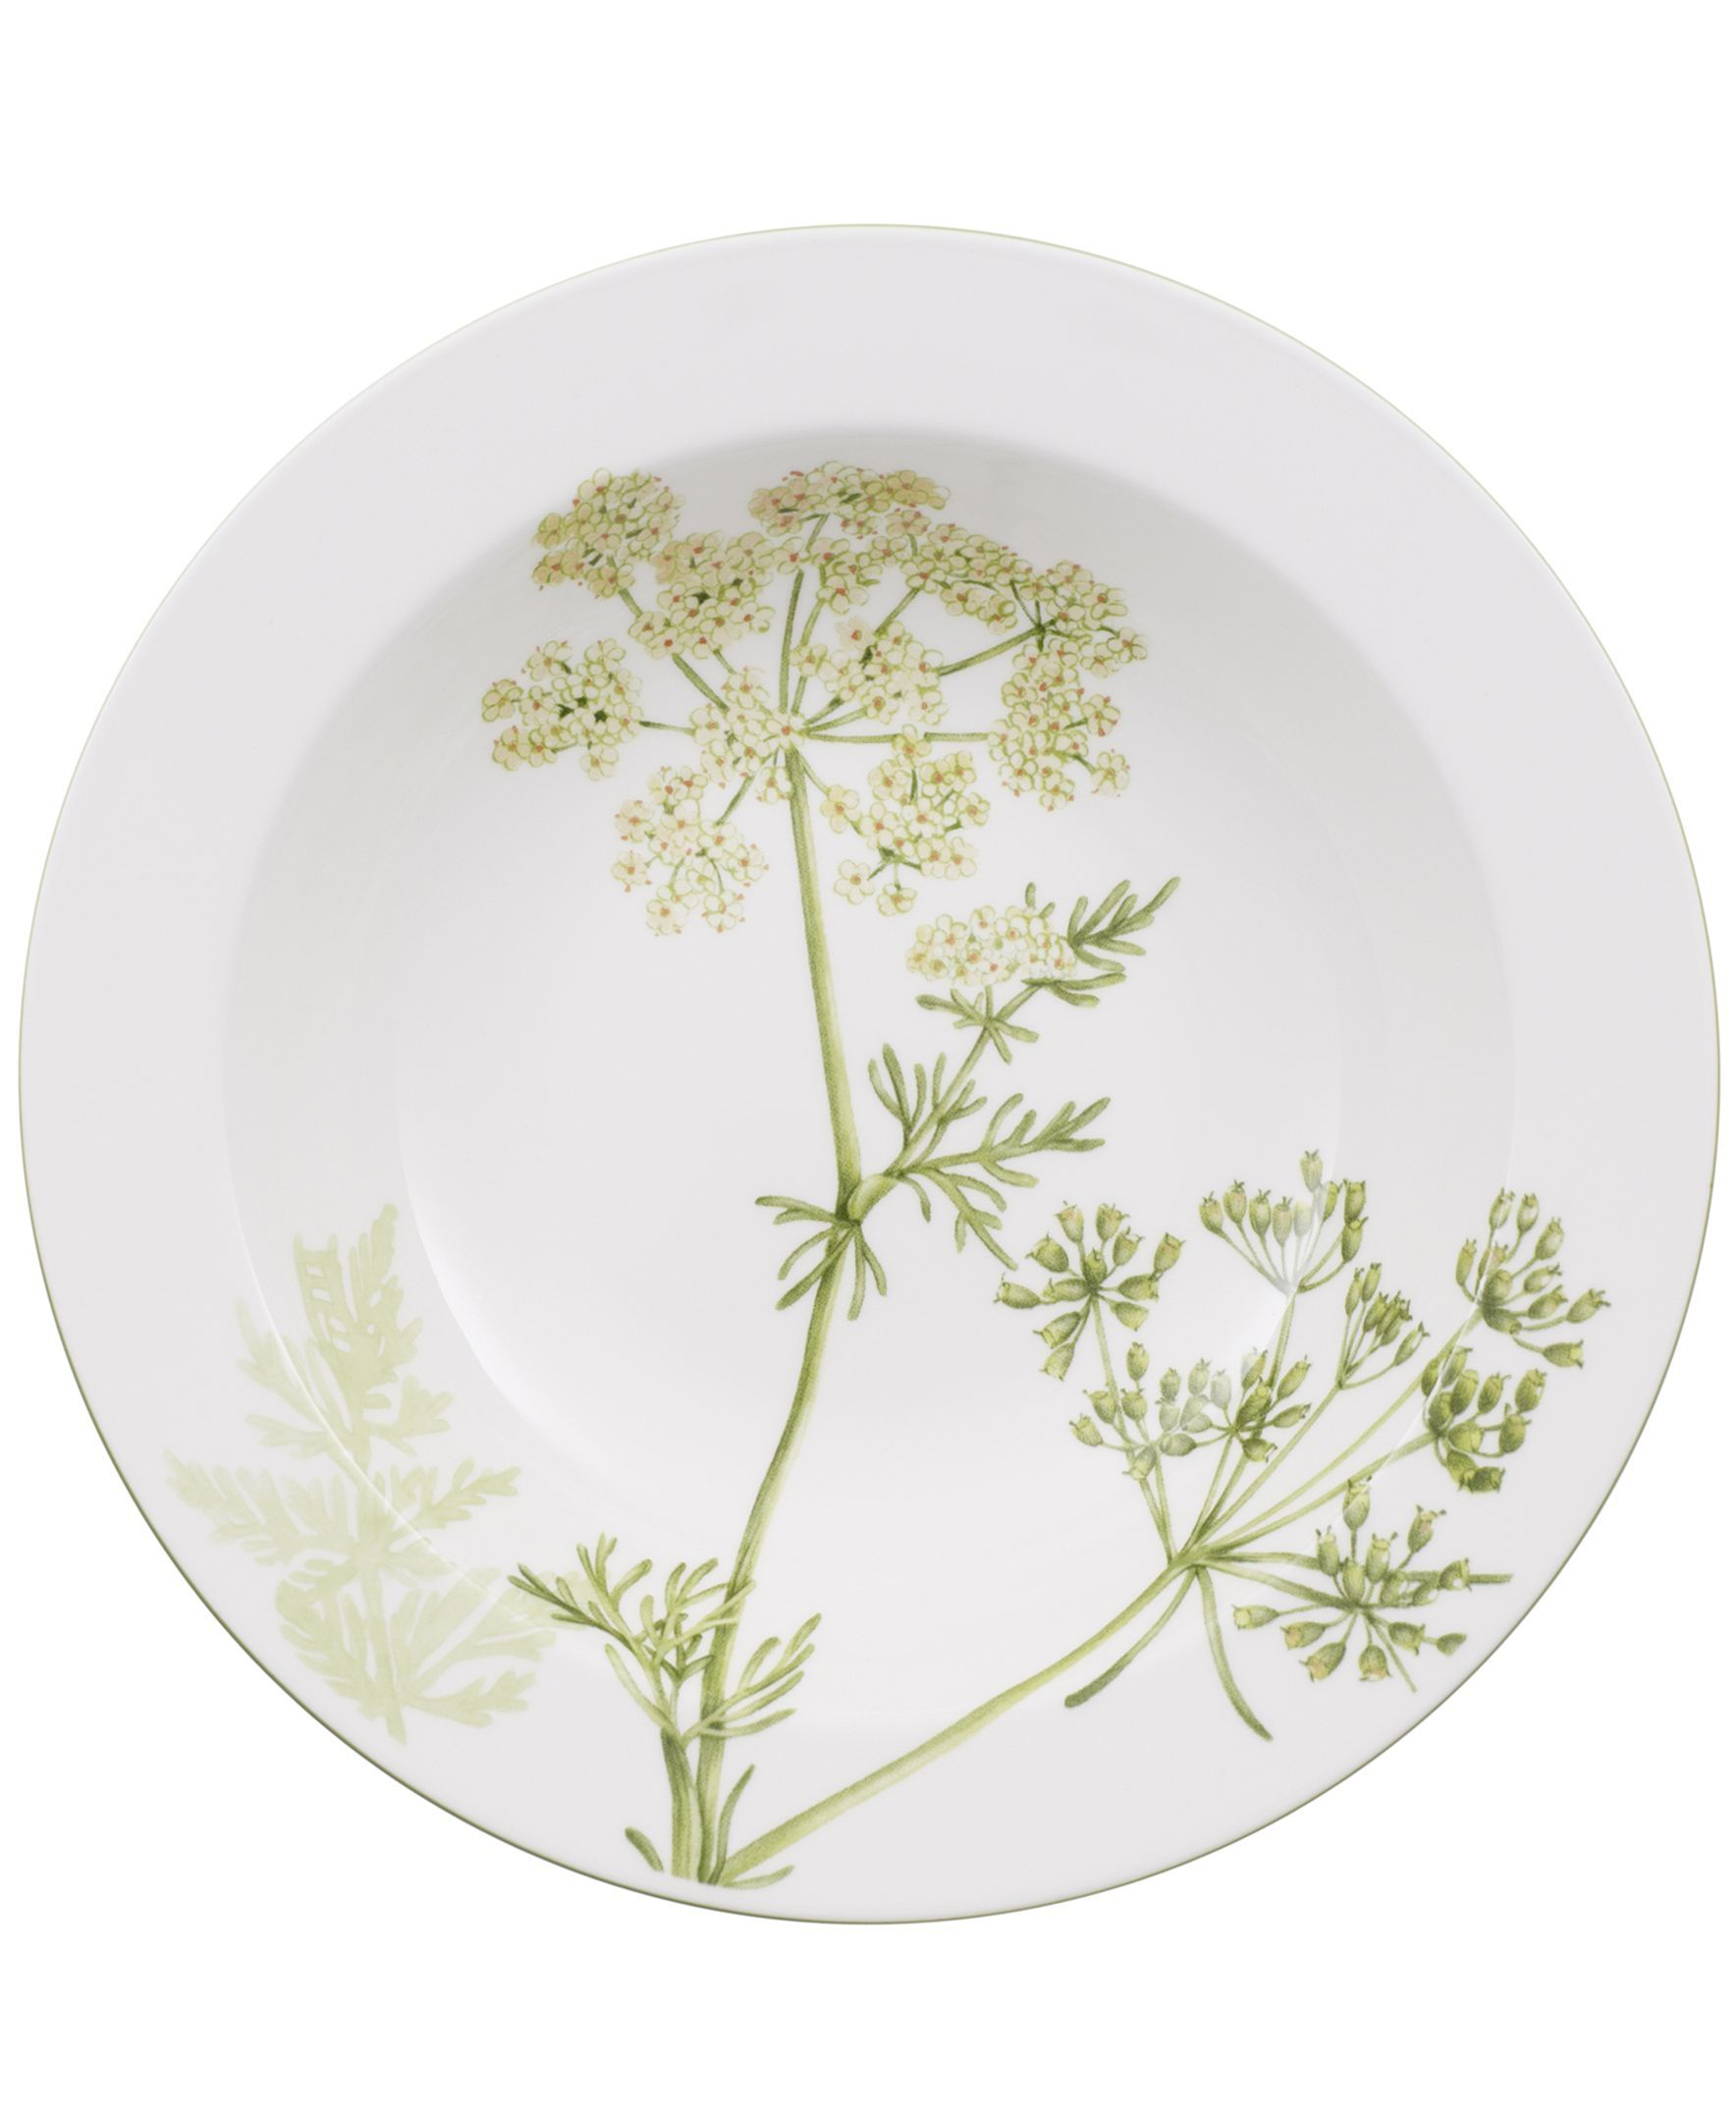 Villeroy & Boch Dinnerware, Althea Nova Rim Cereal Bowl